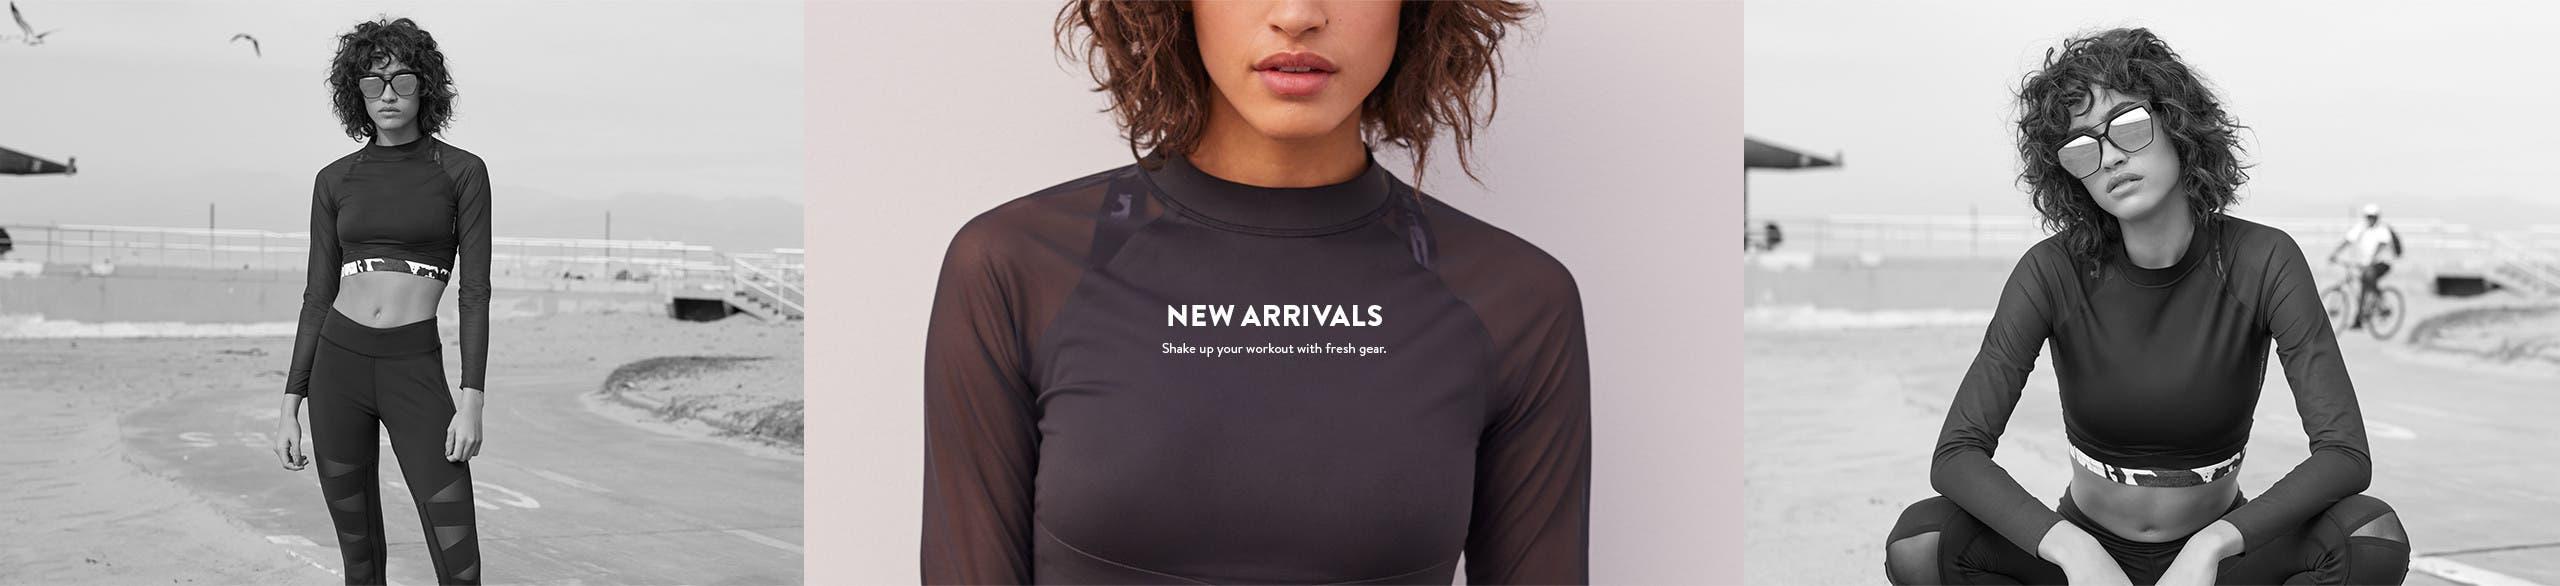 New arrivals in activewear.